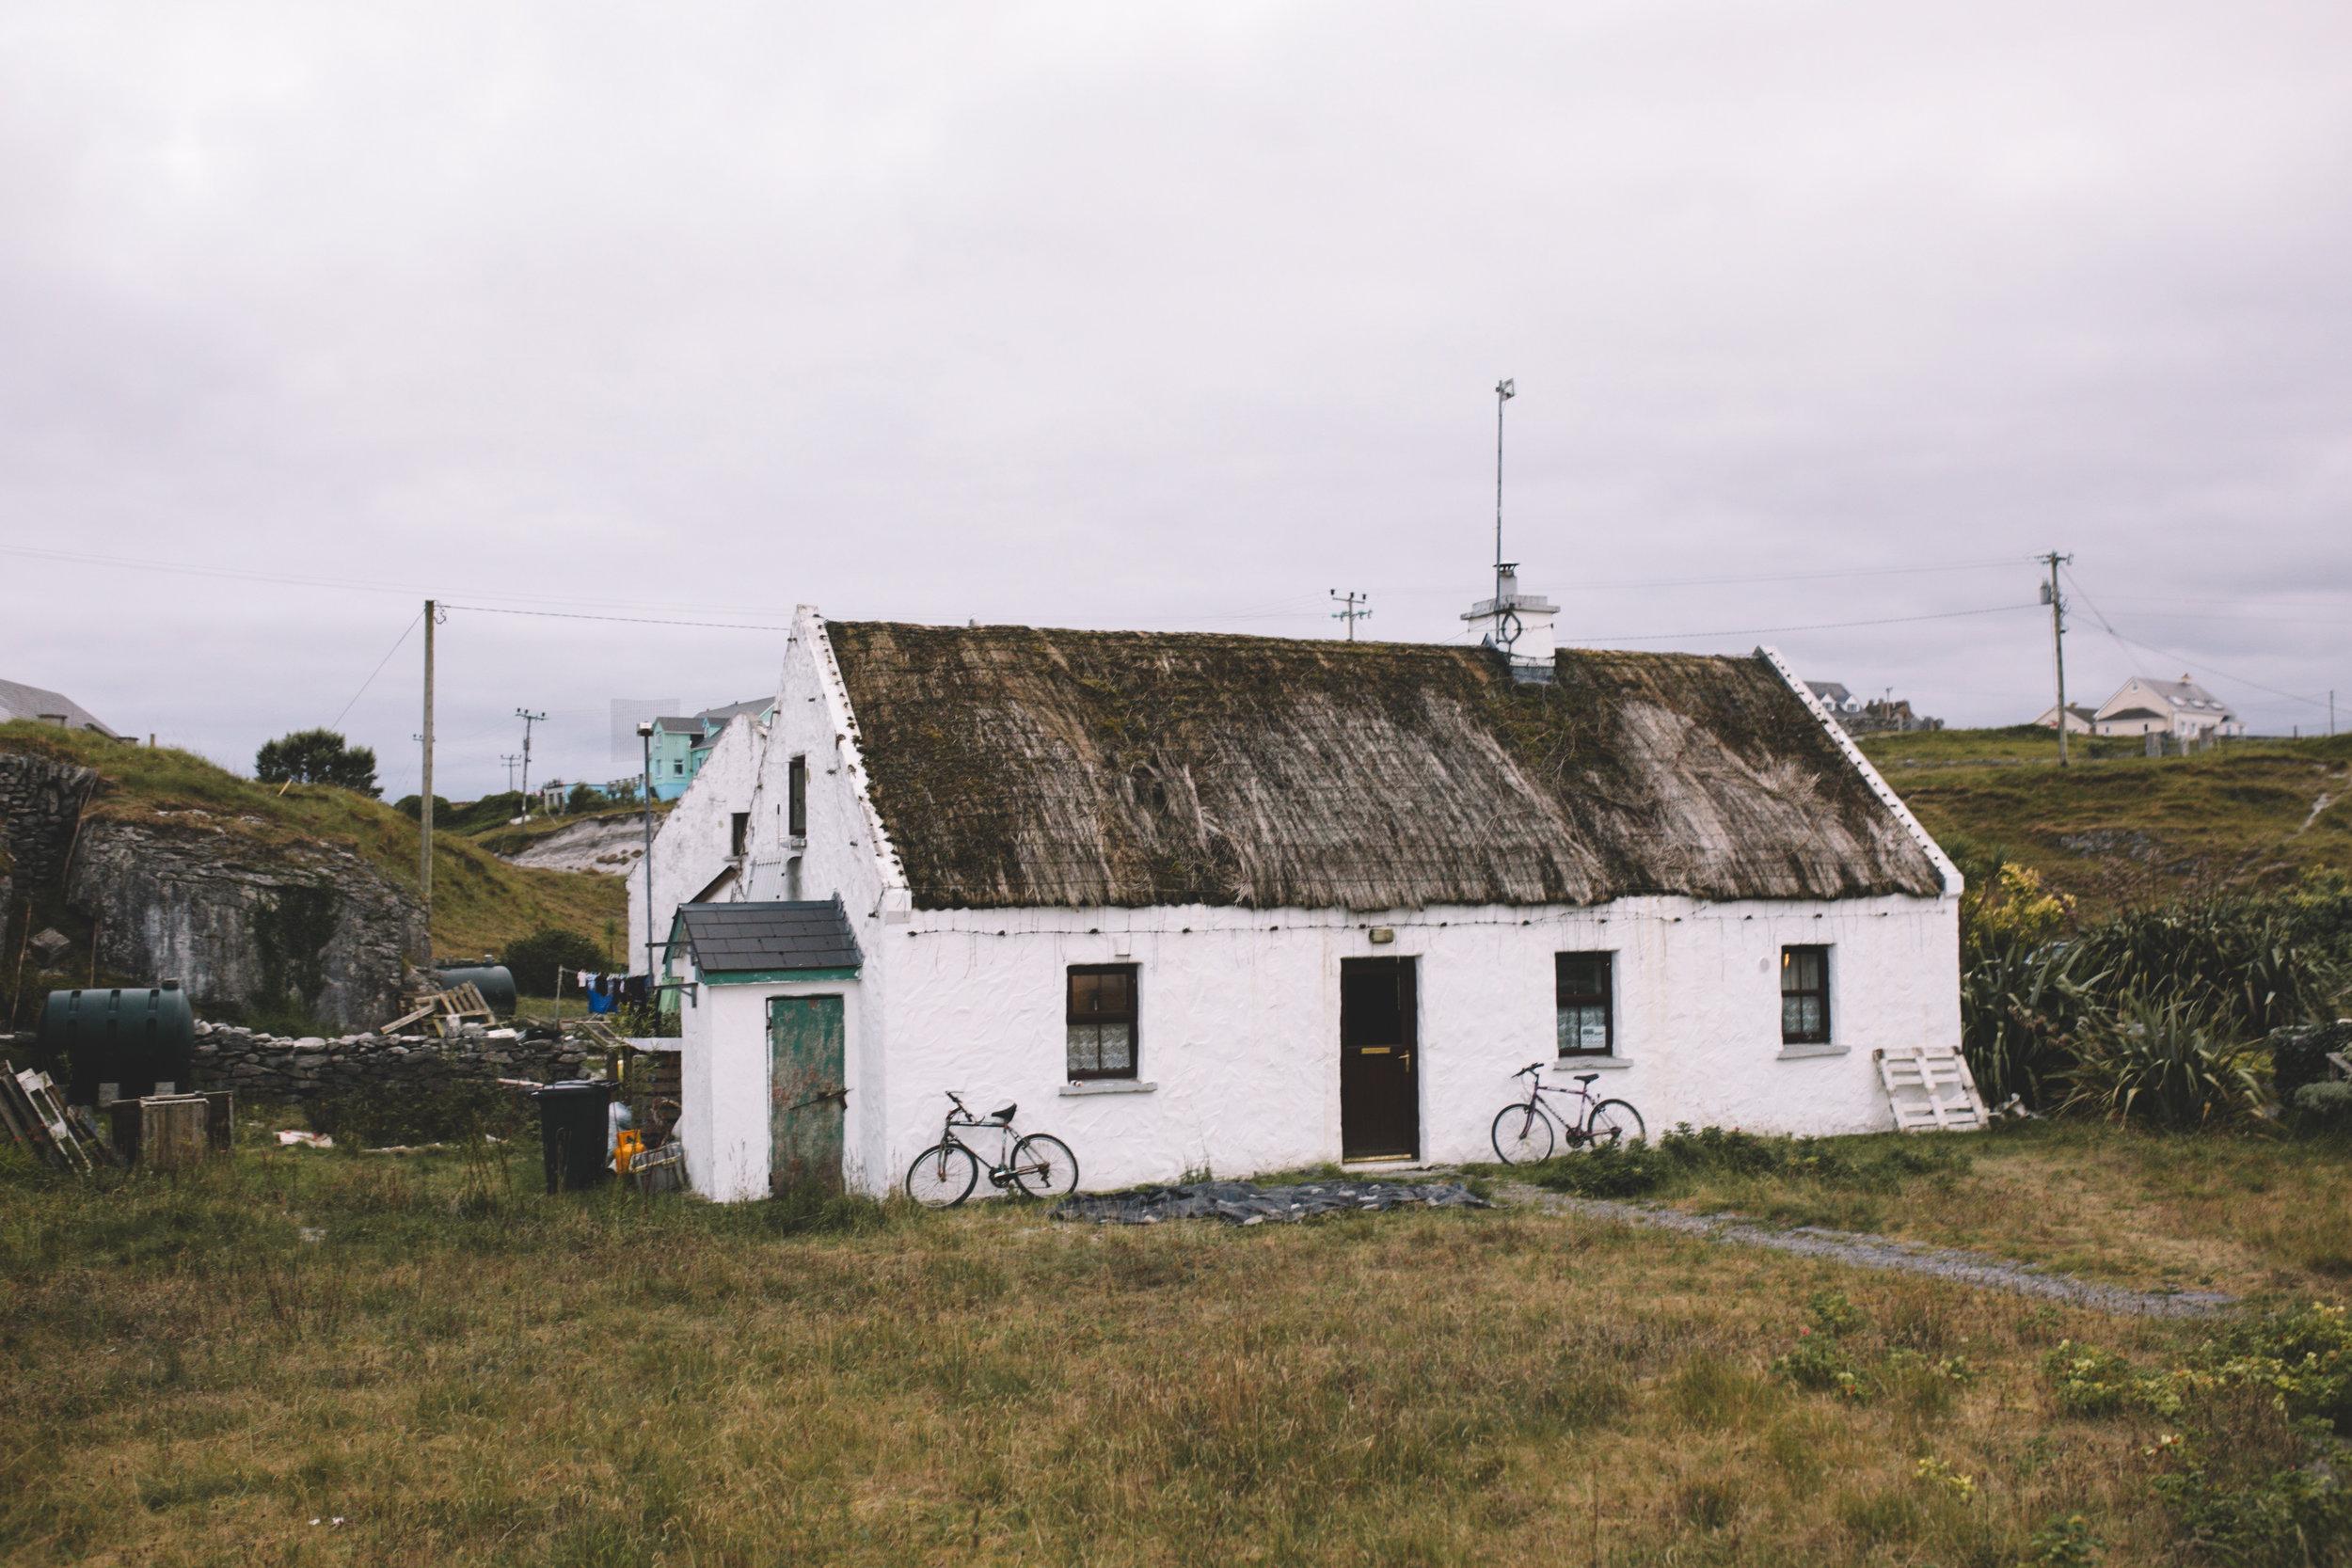 10 Tear Anniversary Trip - Aran Island Inis Orr Cliffs of Moher  (47 of 96).jpg